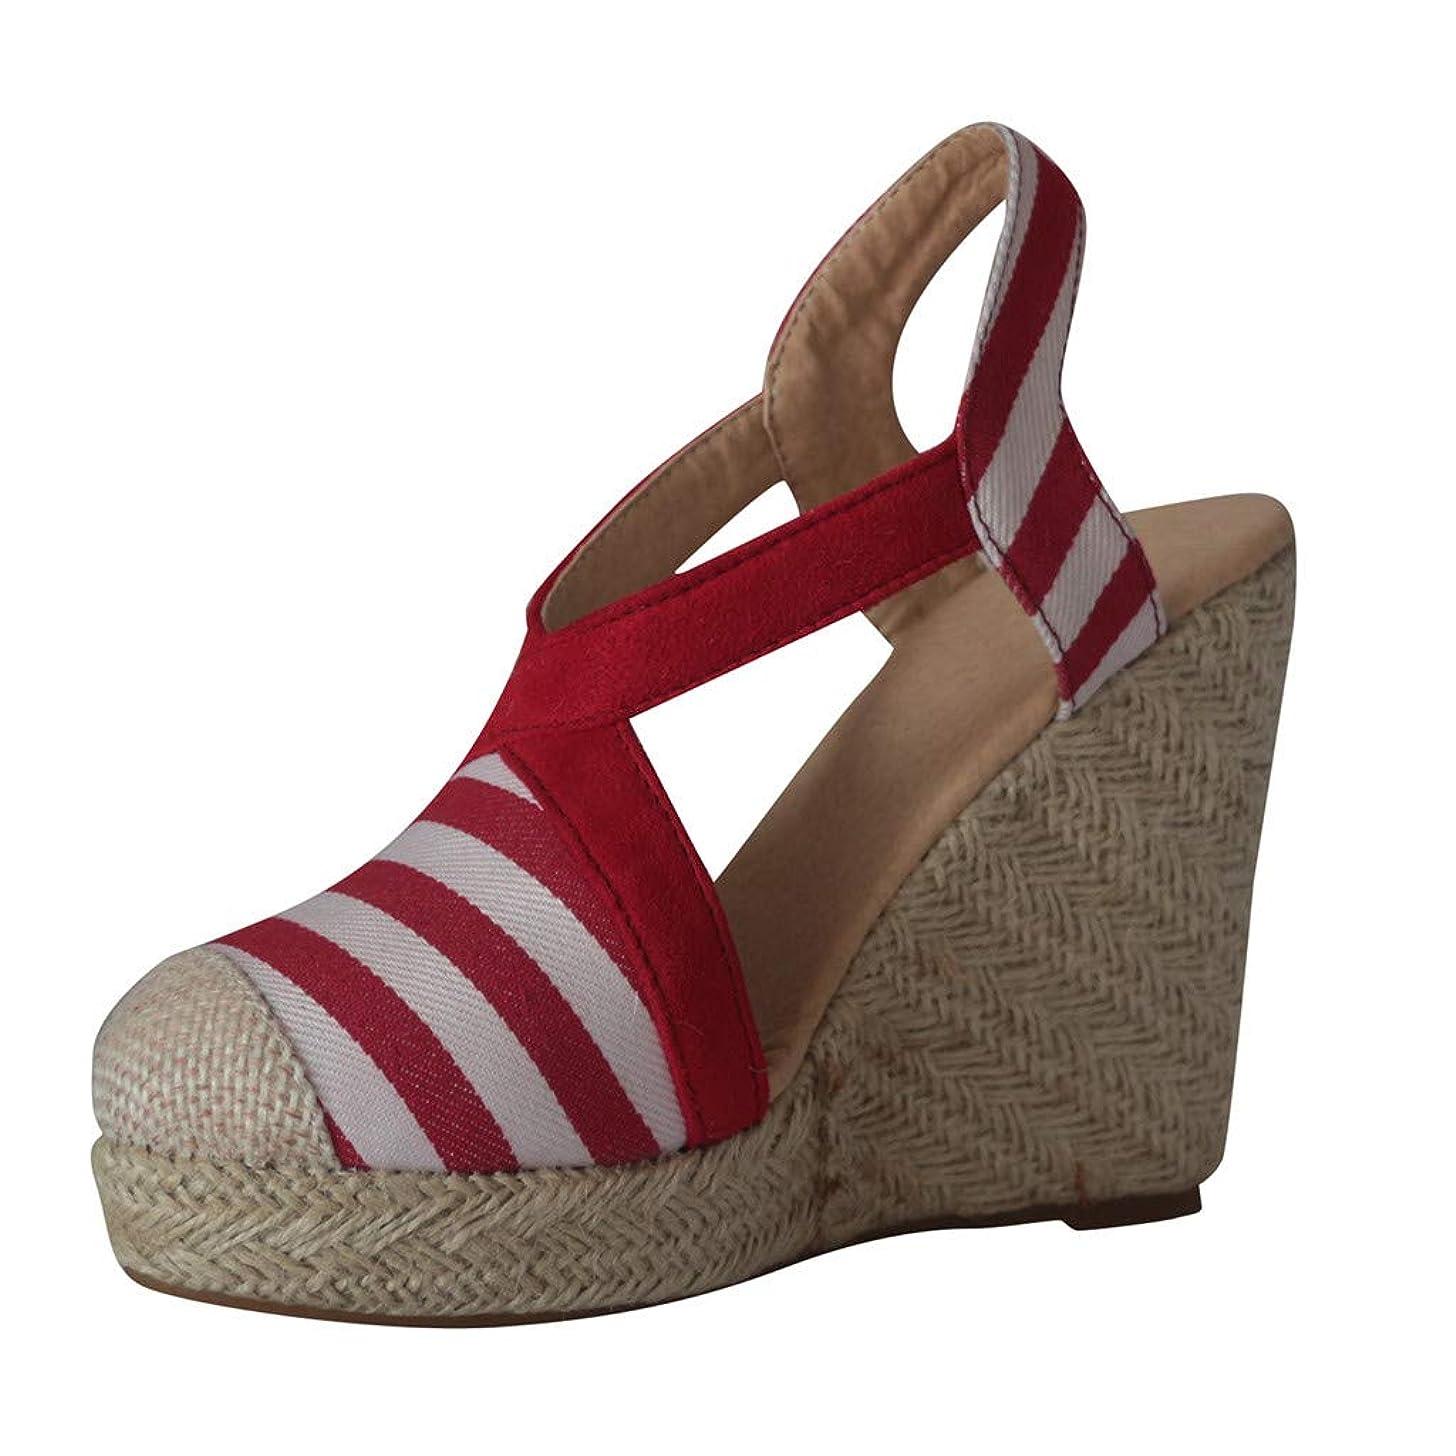 Women's Casual Single Buckle Platform Strap Striped Printed Cap Toe Shoes Espadrilles Wedges Sandals JHKUNO